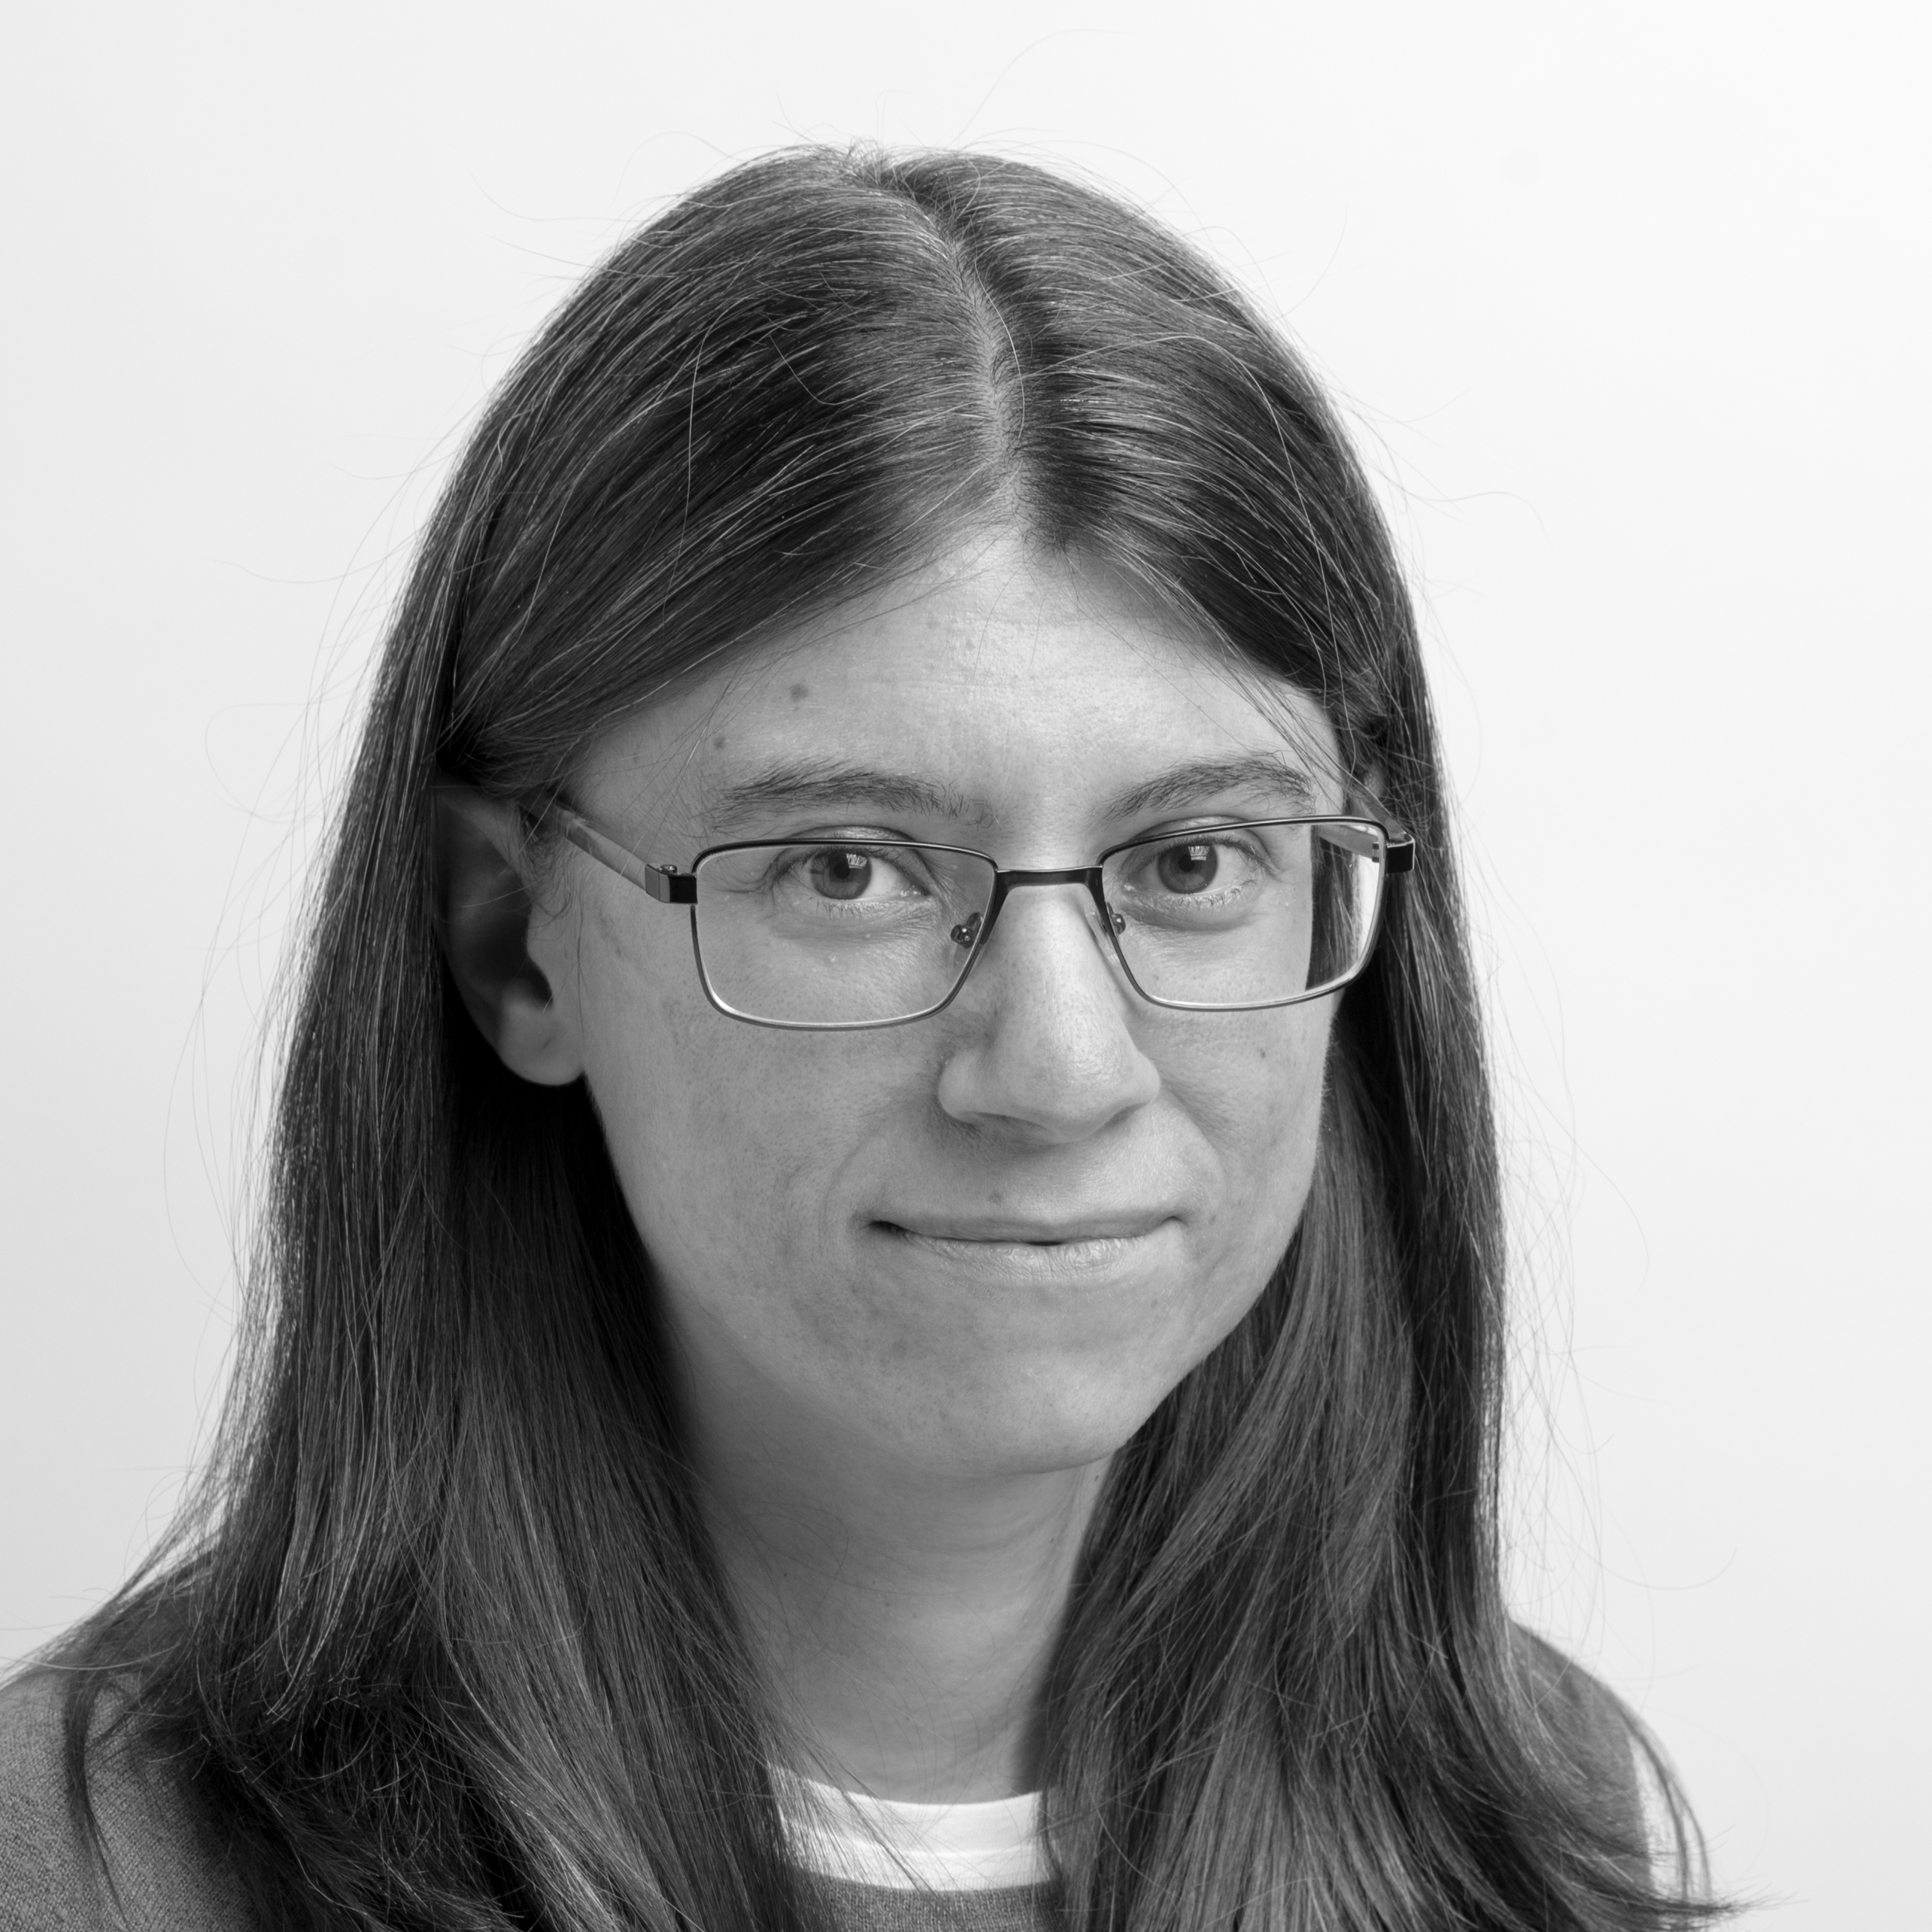 Natalia Marcos